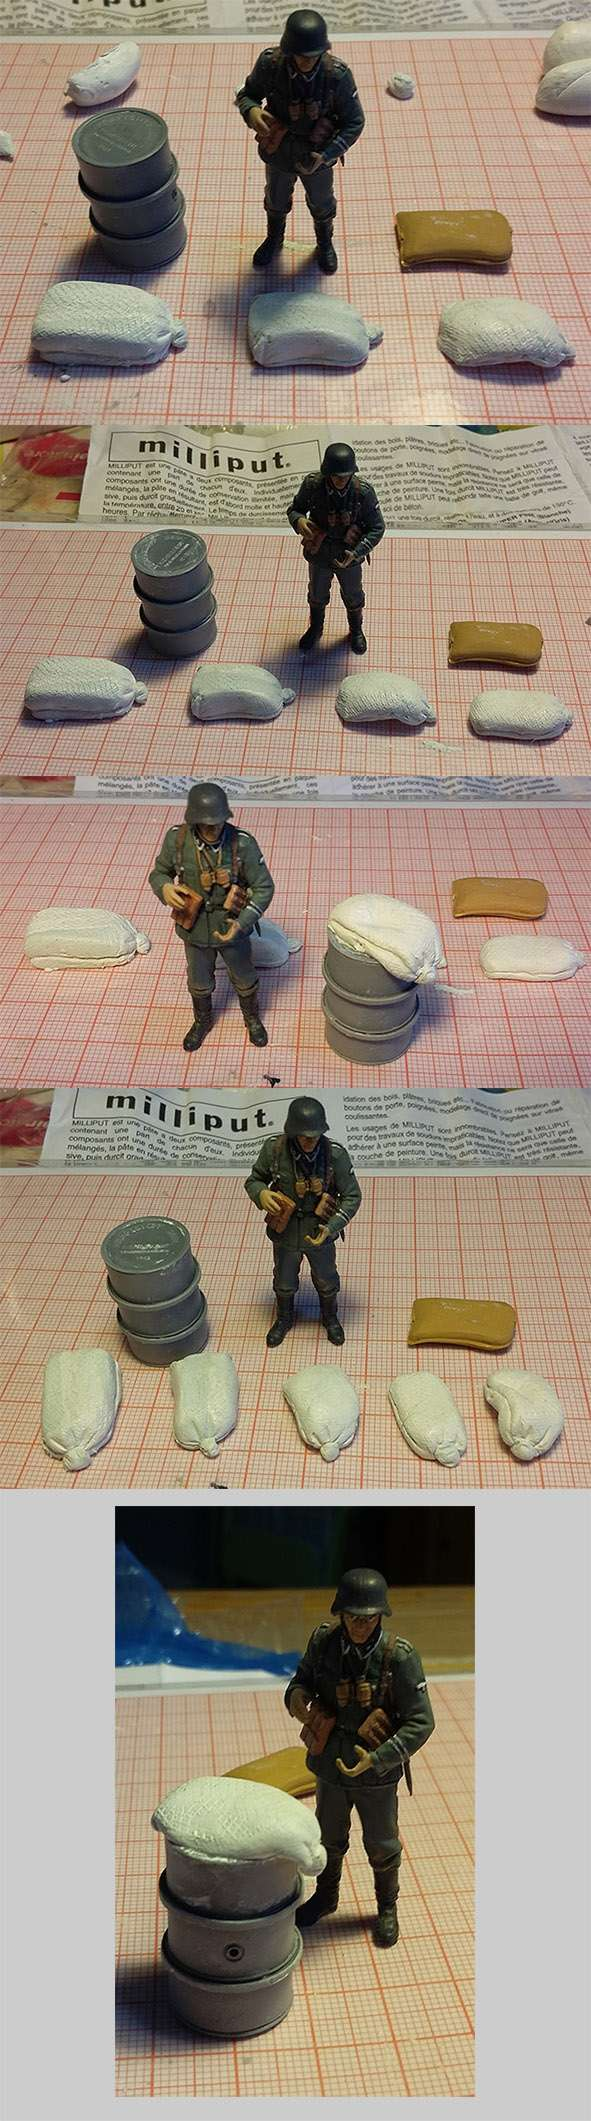 Combat à l'usine désaffectée              Tamiya/Dragon/Vulcain/MENG/Scratch 1/35   - Page 2 16021810